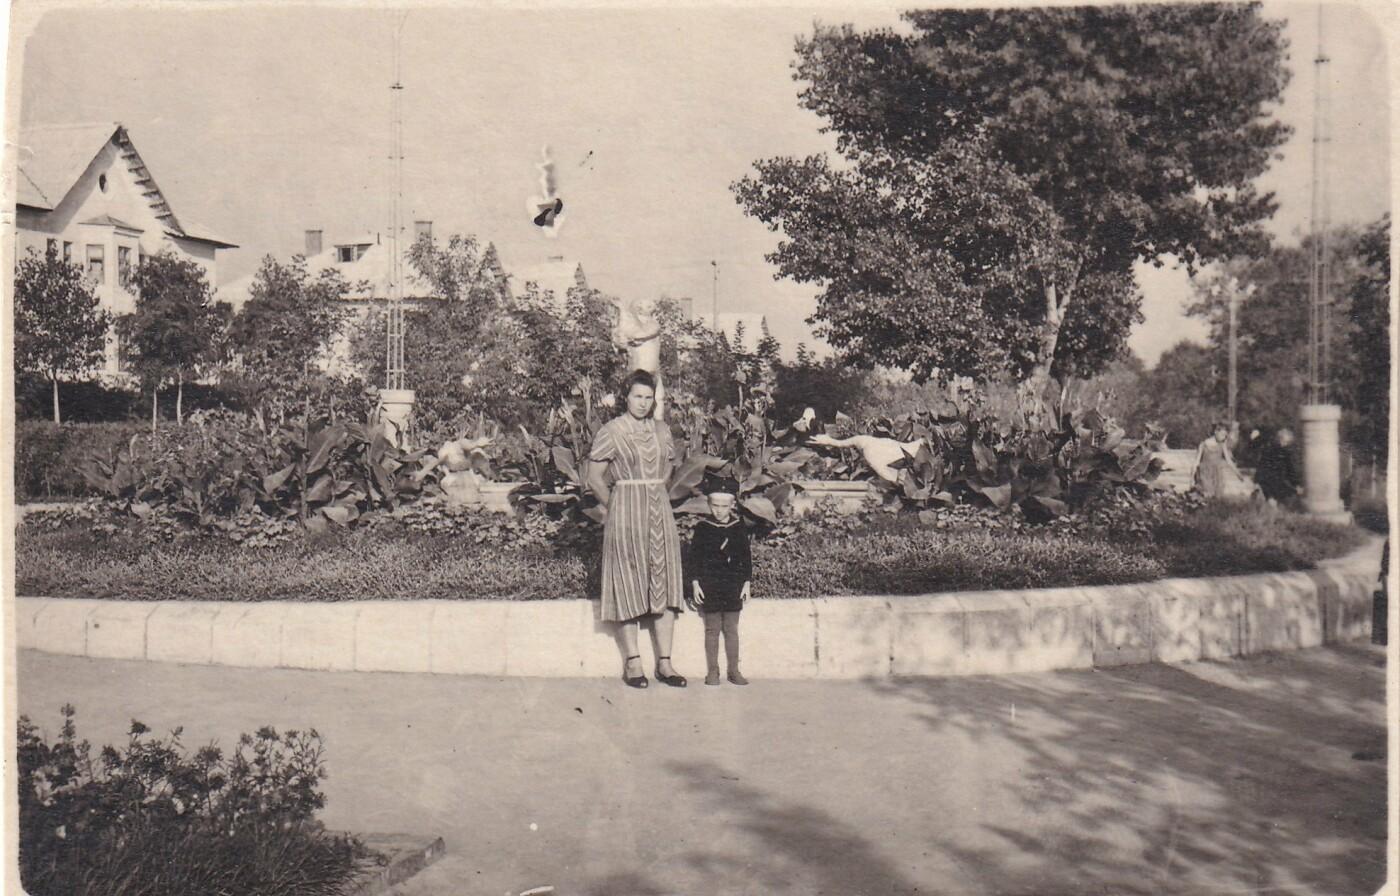 Старый Белгород. Ретро-фоторепортаж из семейного альбома, фото-20